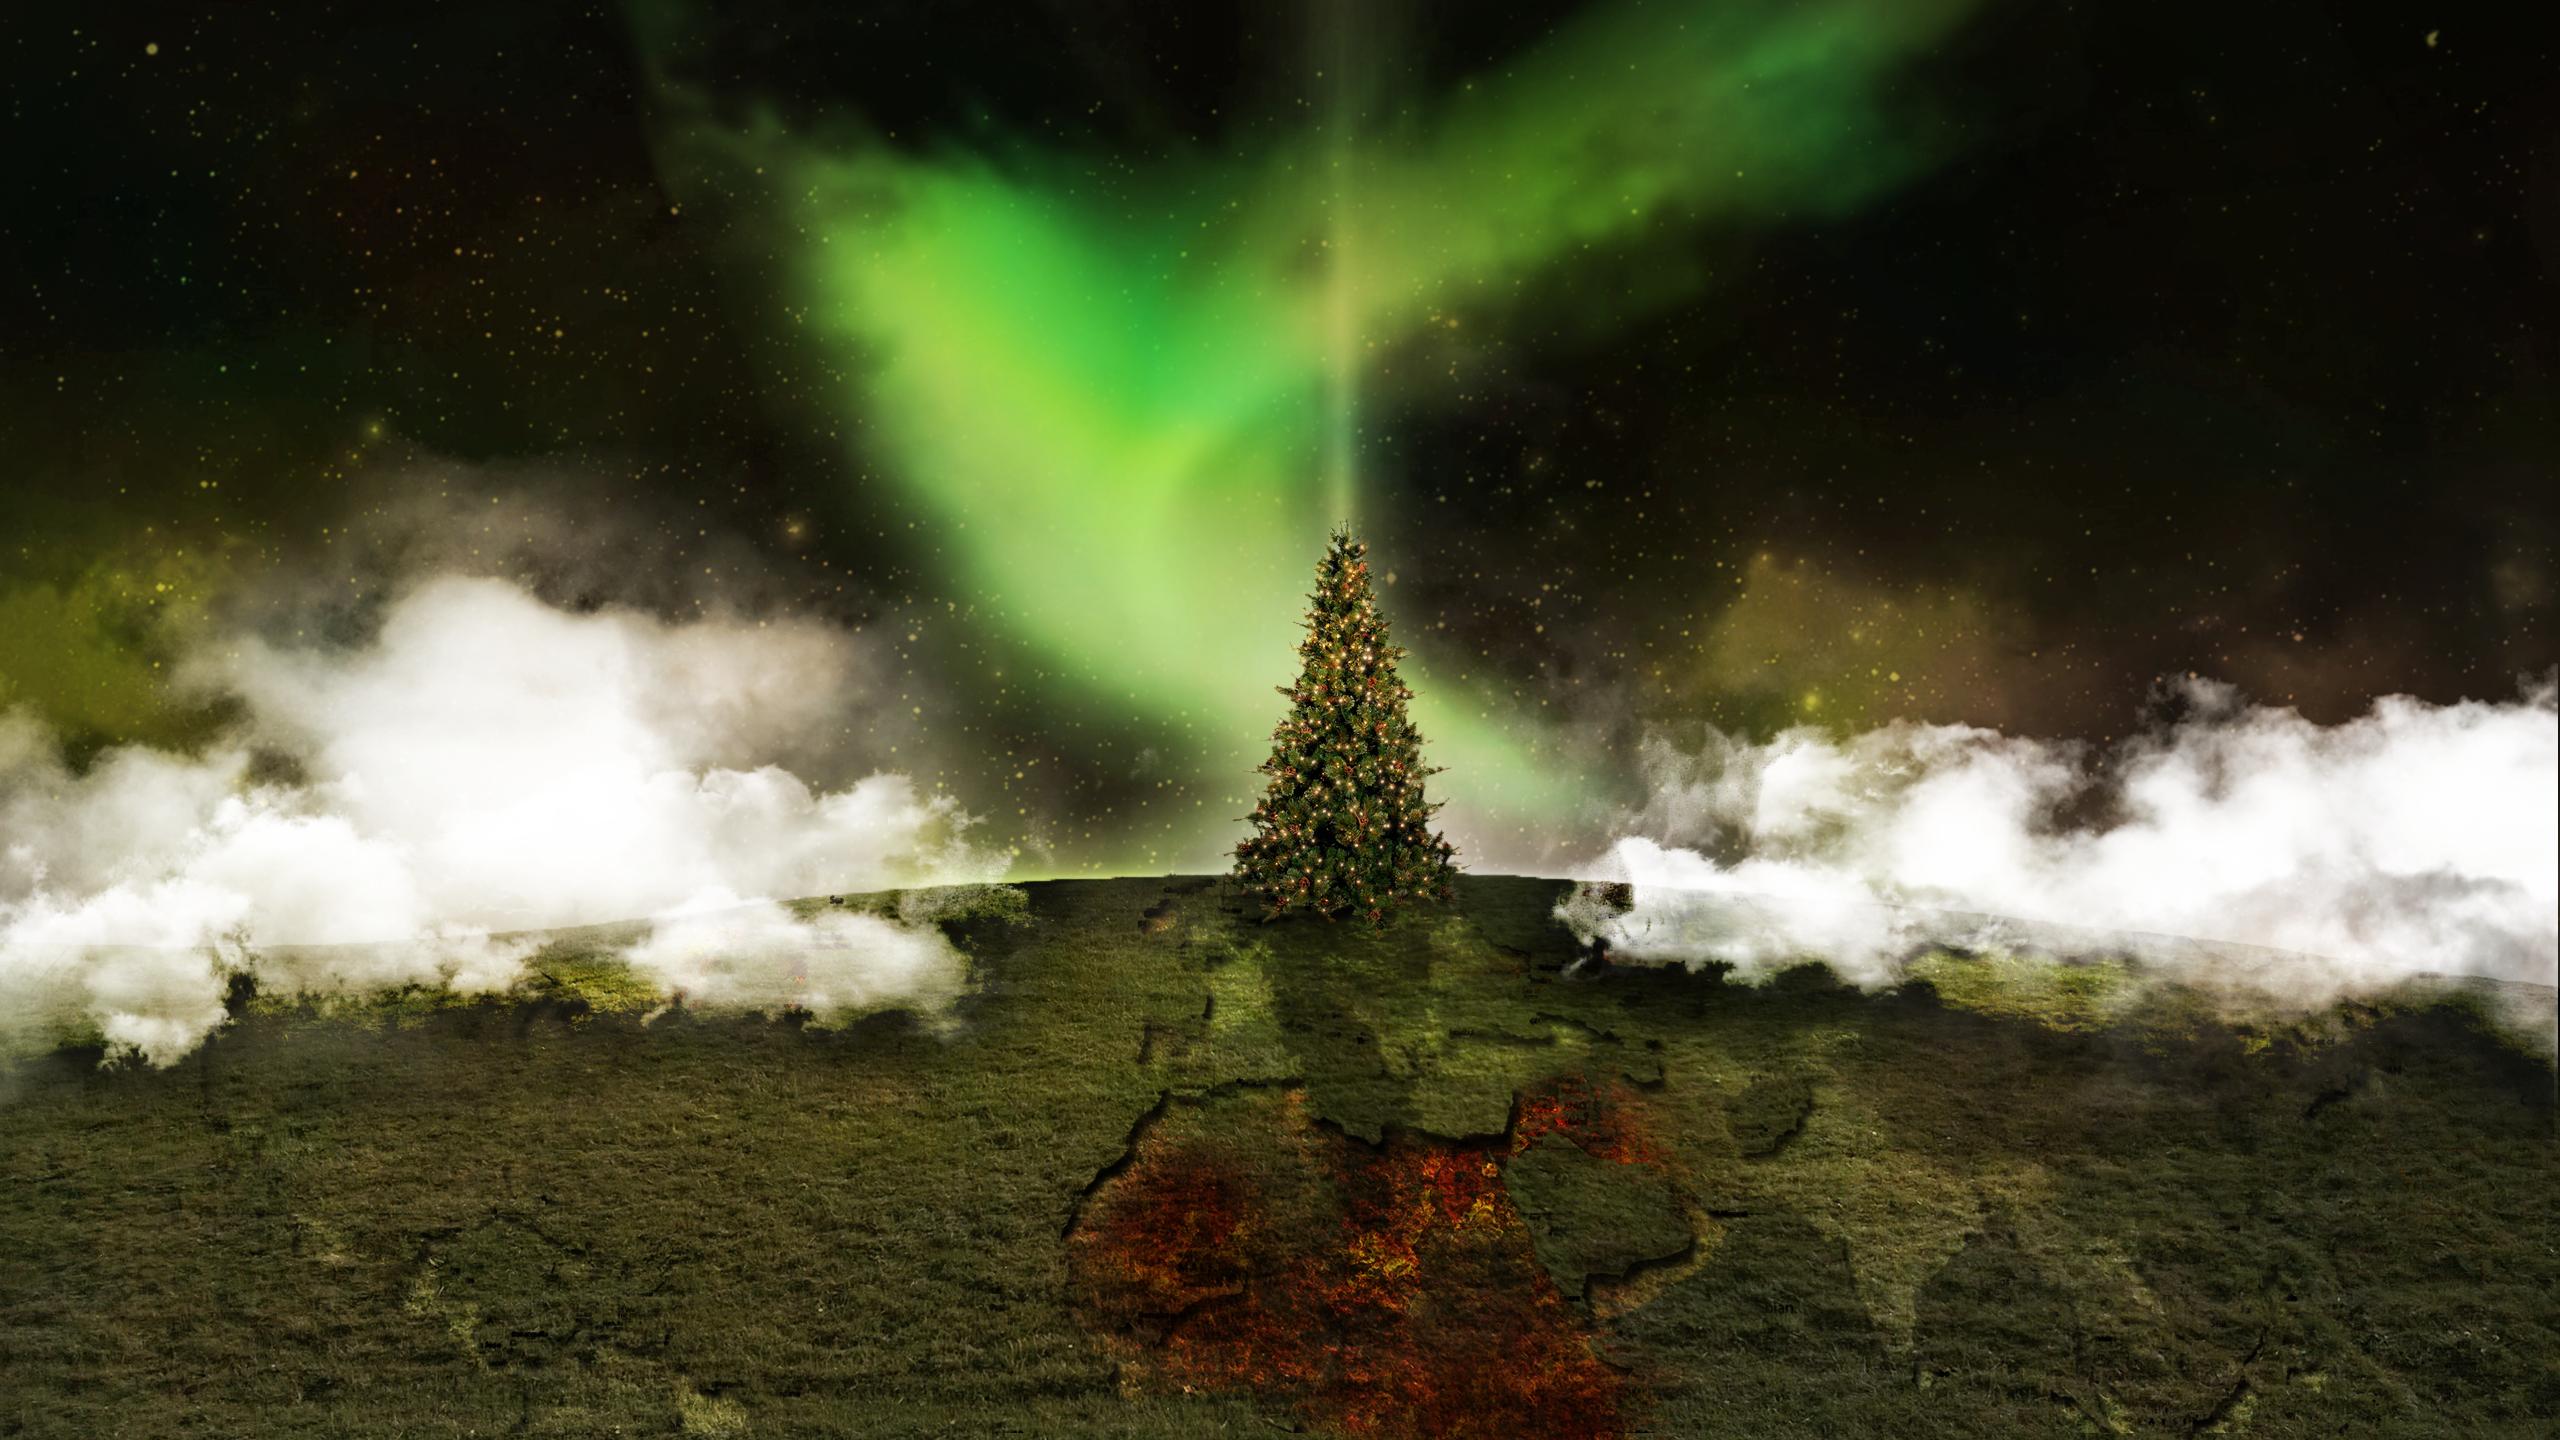 General 2560x1440 Christmas Tree digital art sky night sky